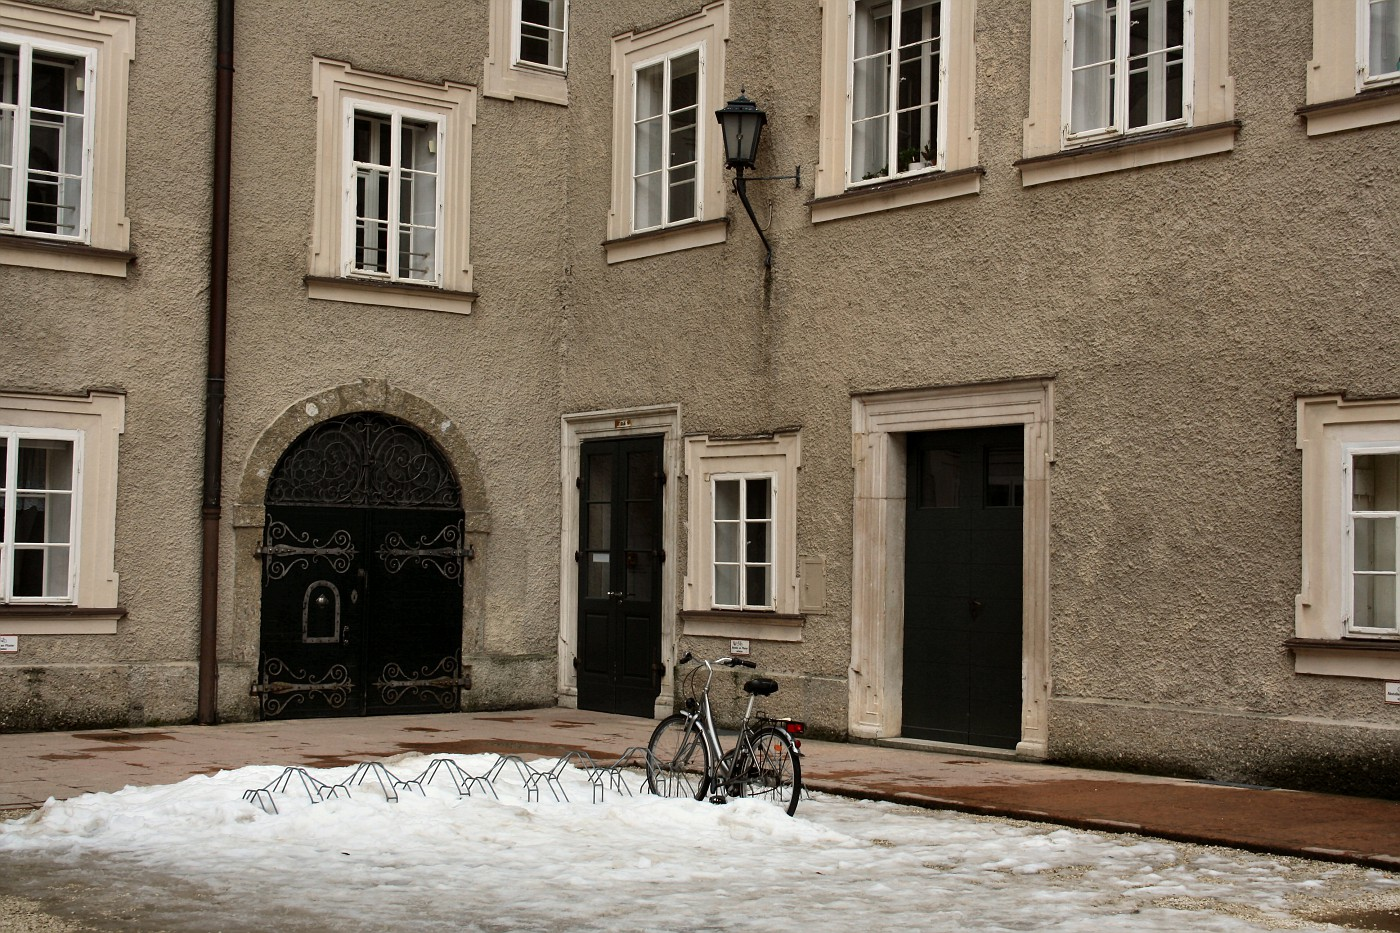 http://images51.fotki.com/v174/photos/2/243162/8488810/Salzburg33-vi.jpg